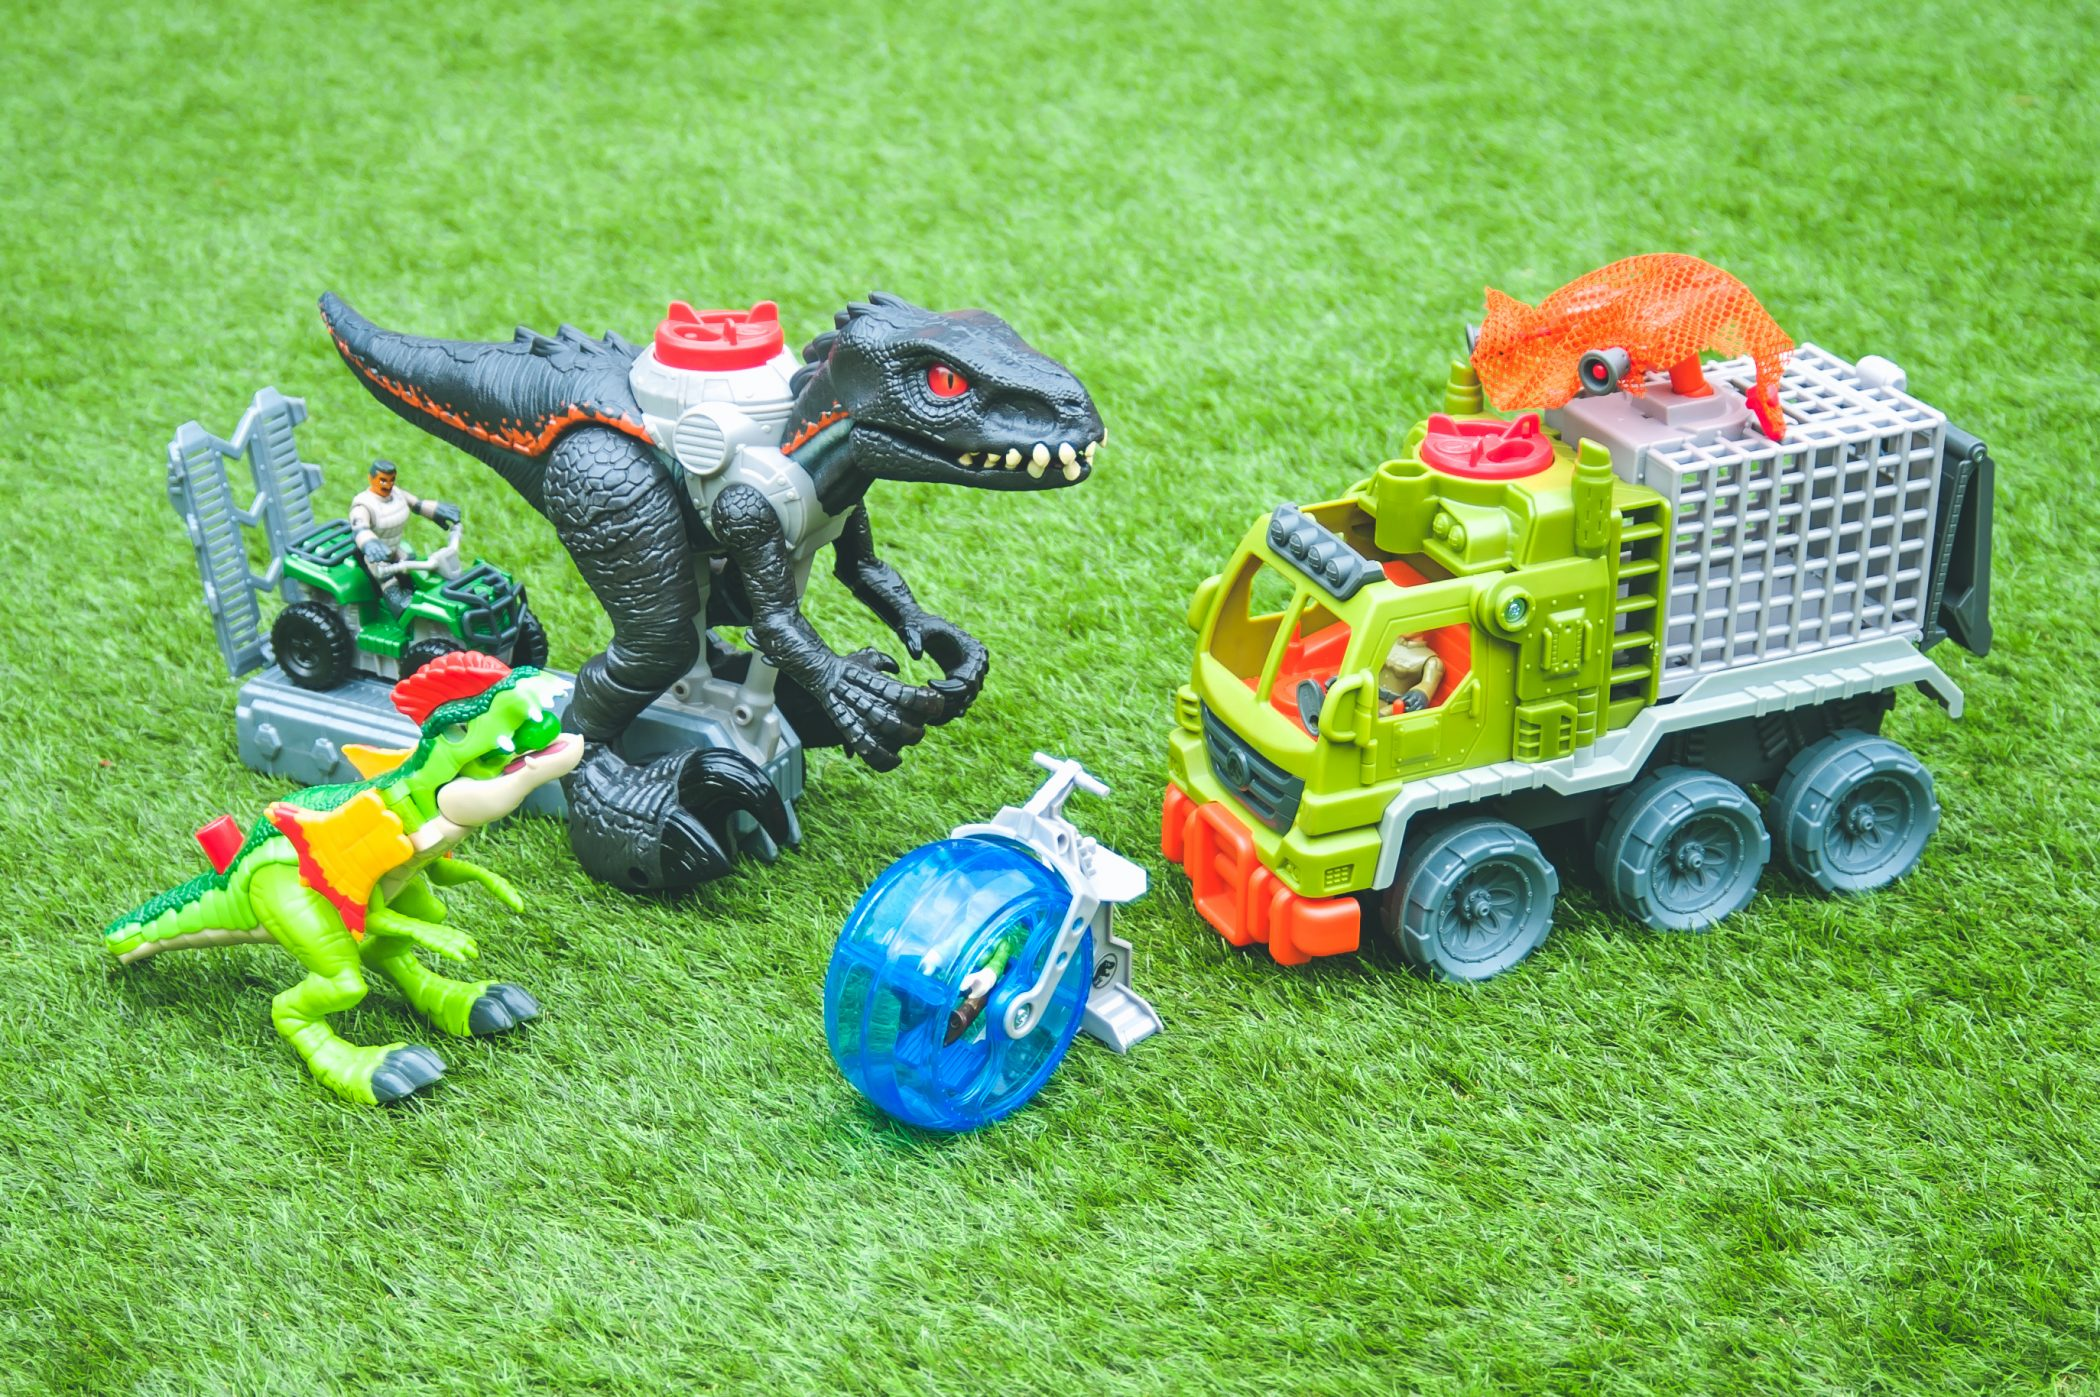 Review: Fisher-Price Imaginext Jurassic World Toy Range